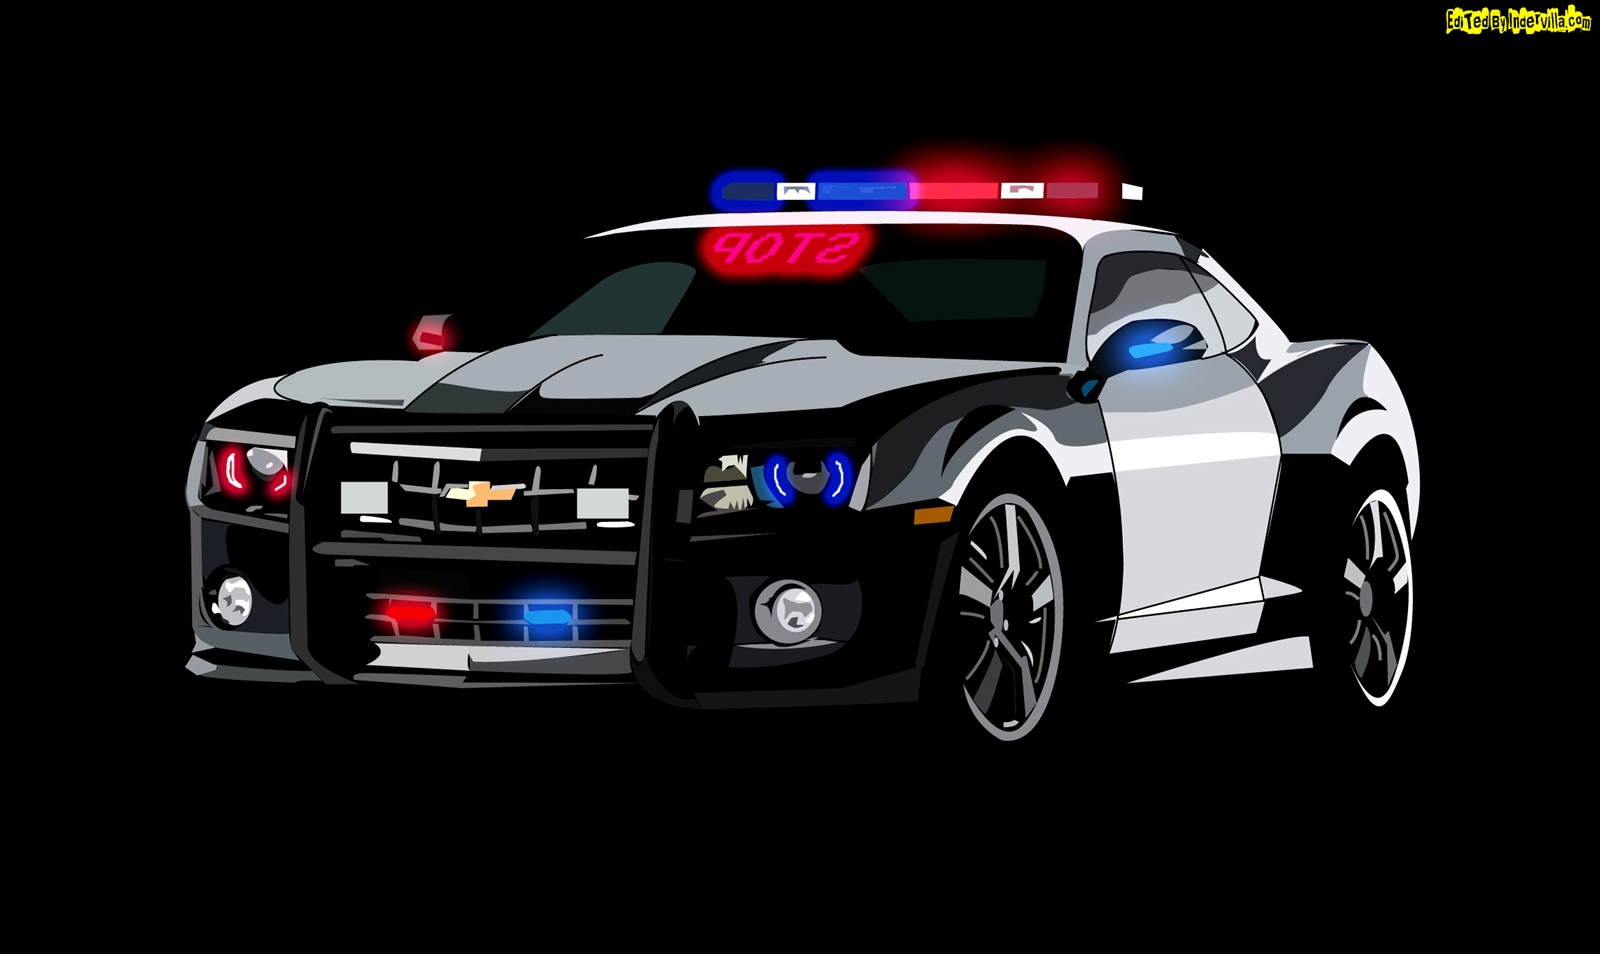 Police Car HD Wallpaper HD Wallpapers Source 1600x954